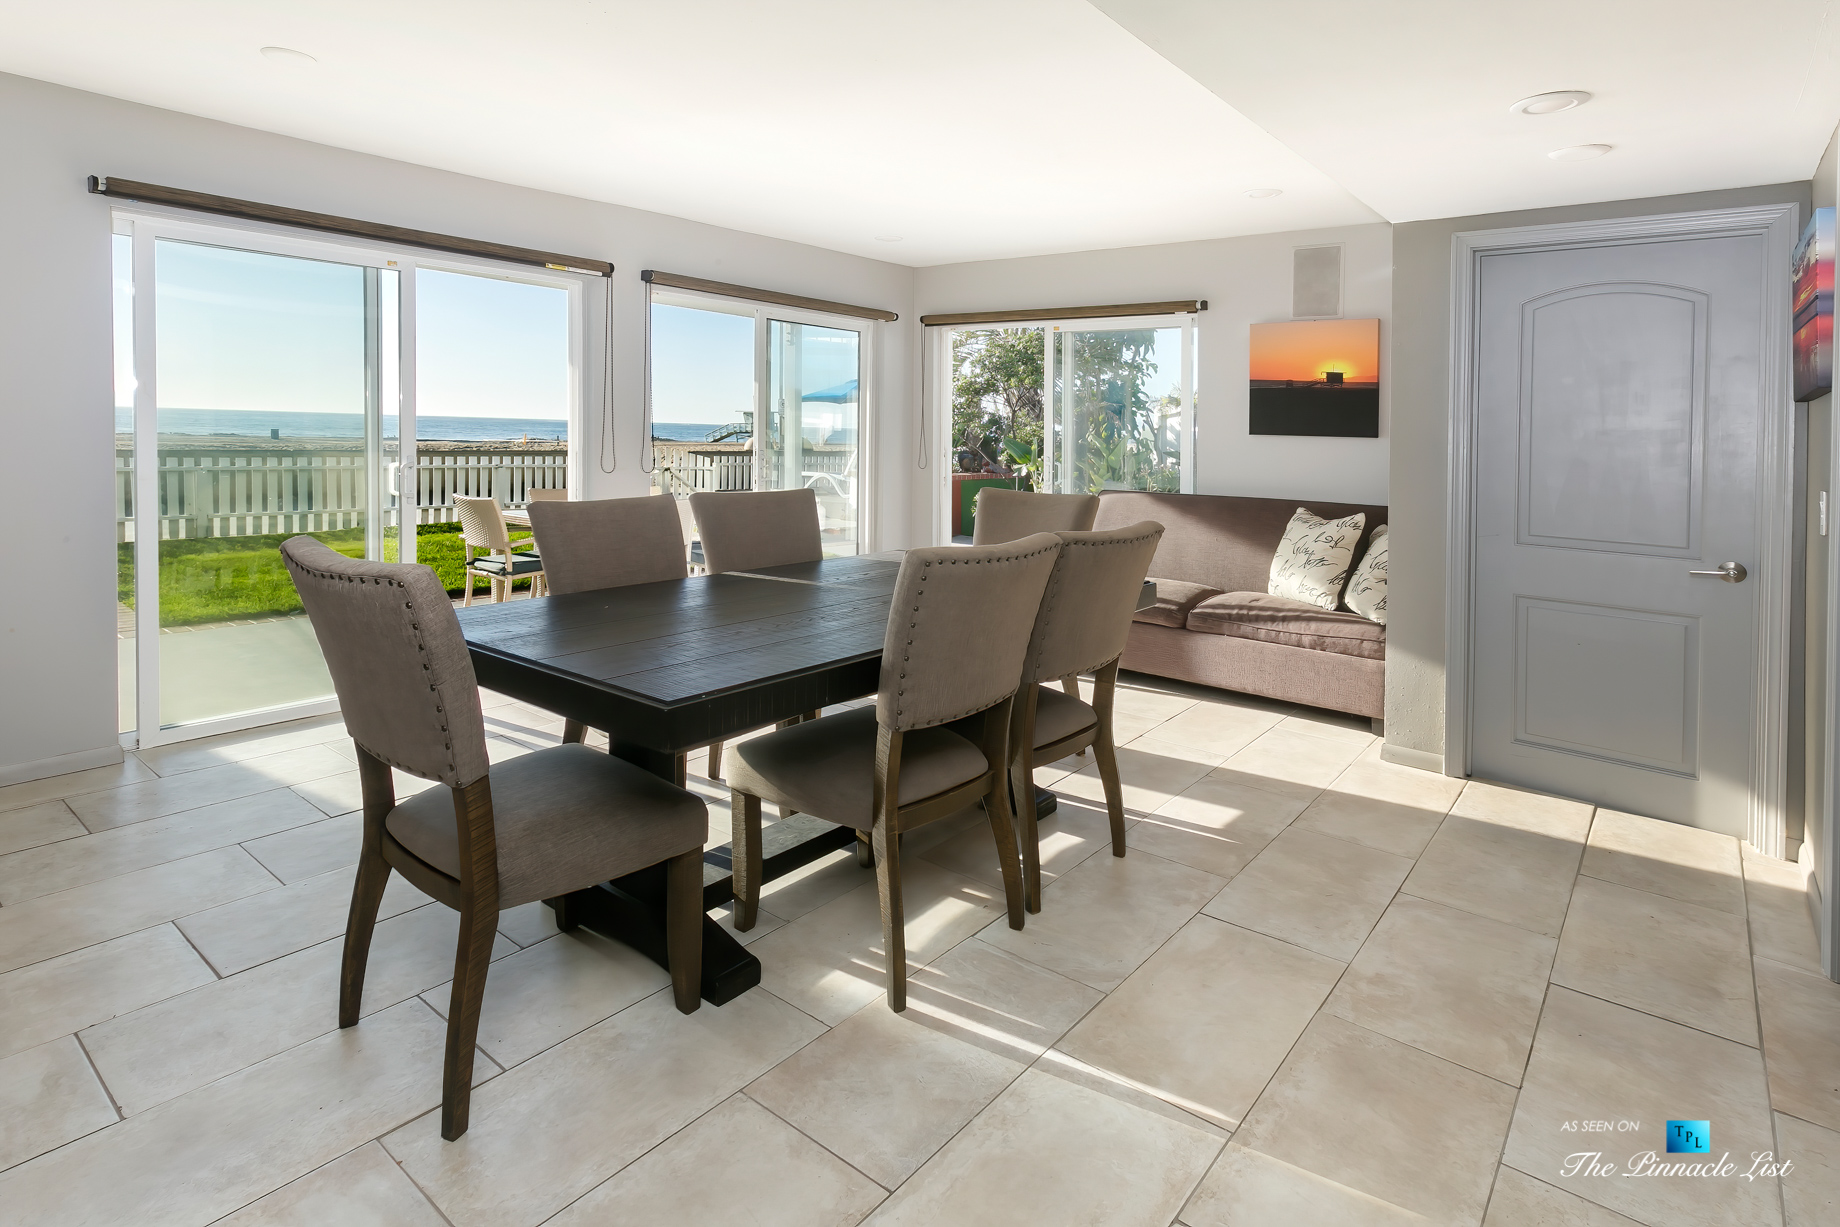 3500 The Strand, Hermosa Beach, CA, USA - Dining Area – Luxury Real Estate – Original 90210 Beach House - Oceanfront Home